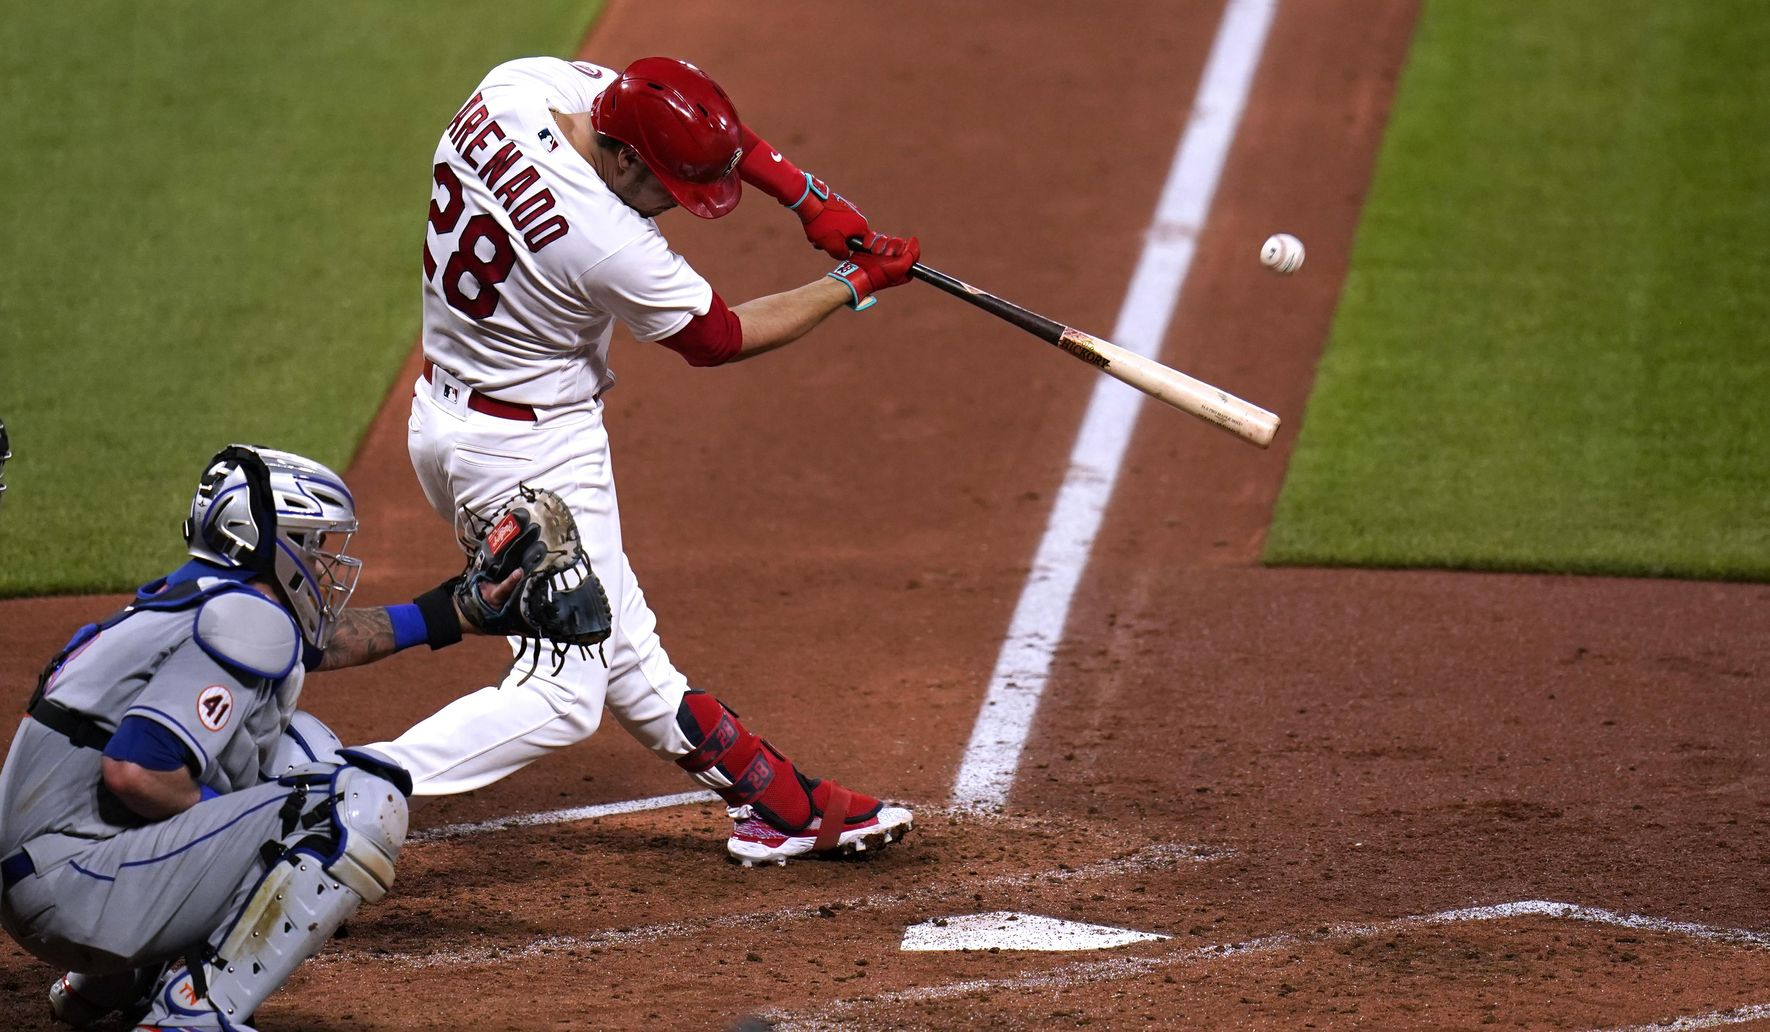 Mets_cardinals_baseball_93862_c0-184-4413-2757_s1770x1032